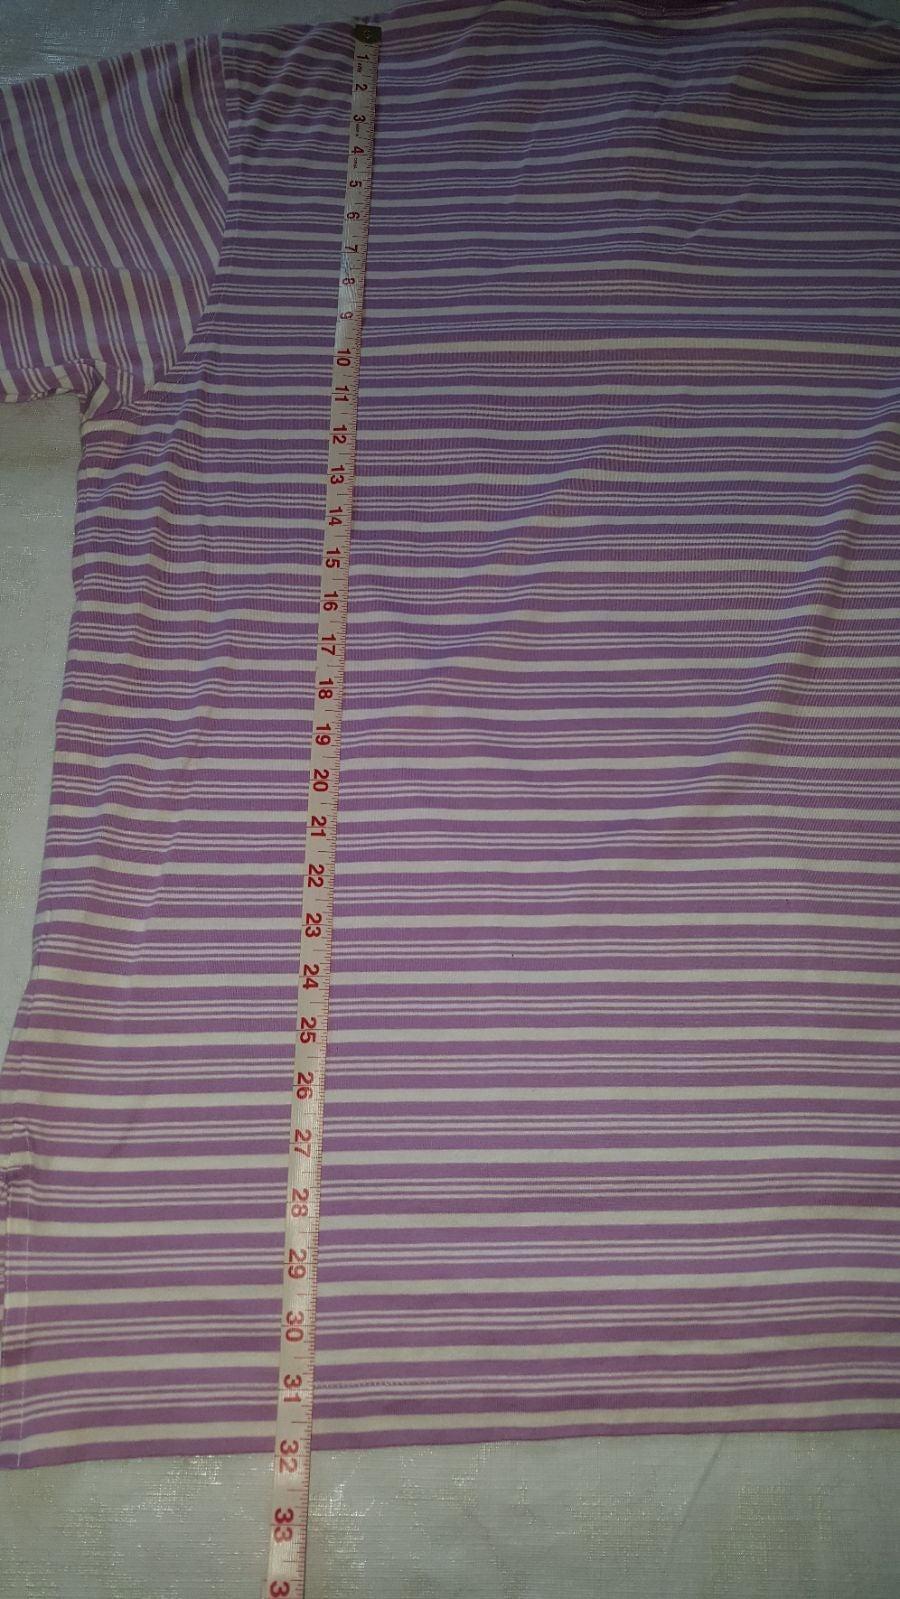 Men, Polo Shirt, Striped Lilac and White